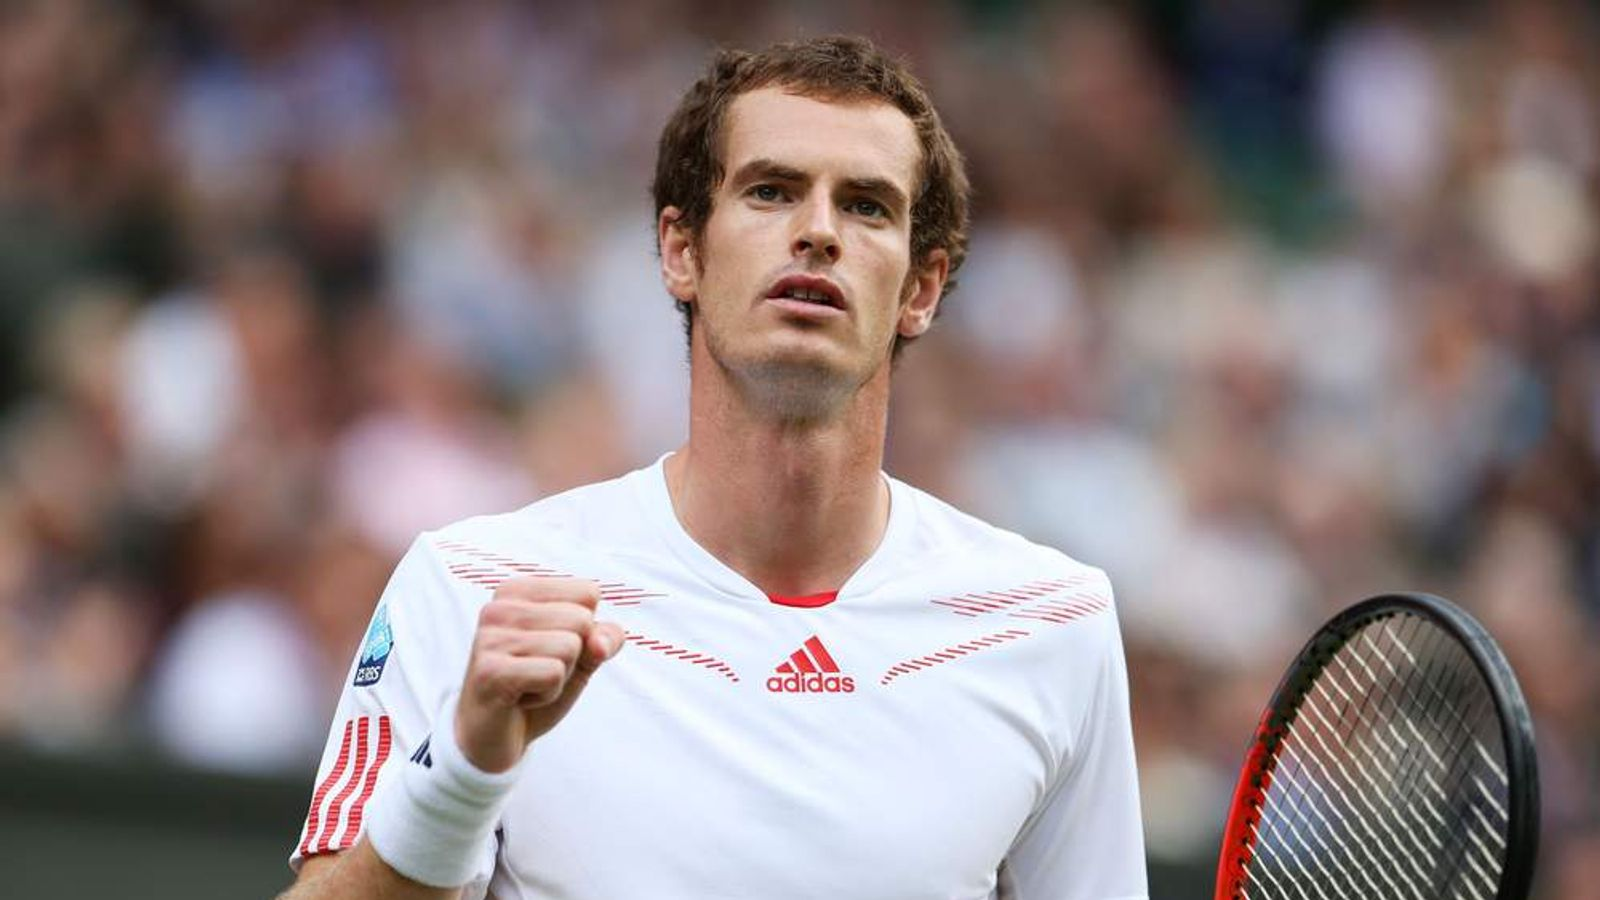 Andy Murray plays Jo-Wilfried Tsonga in Wimbledon semi-finals